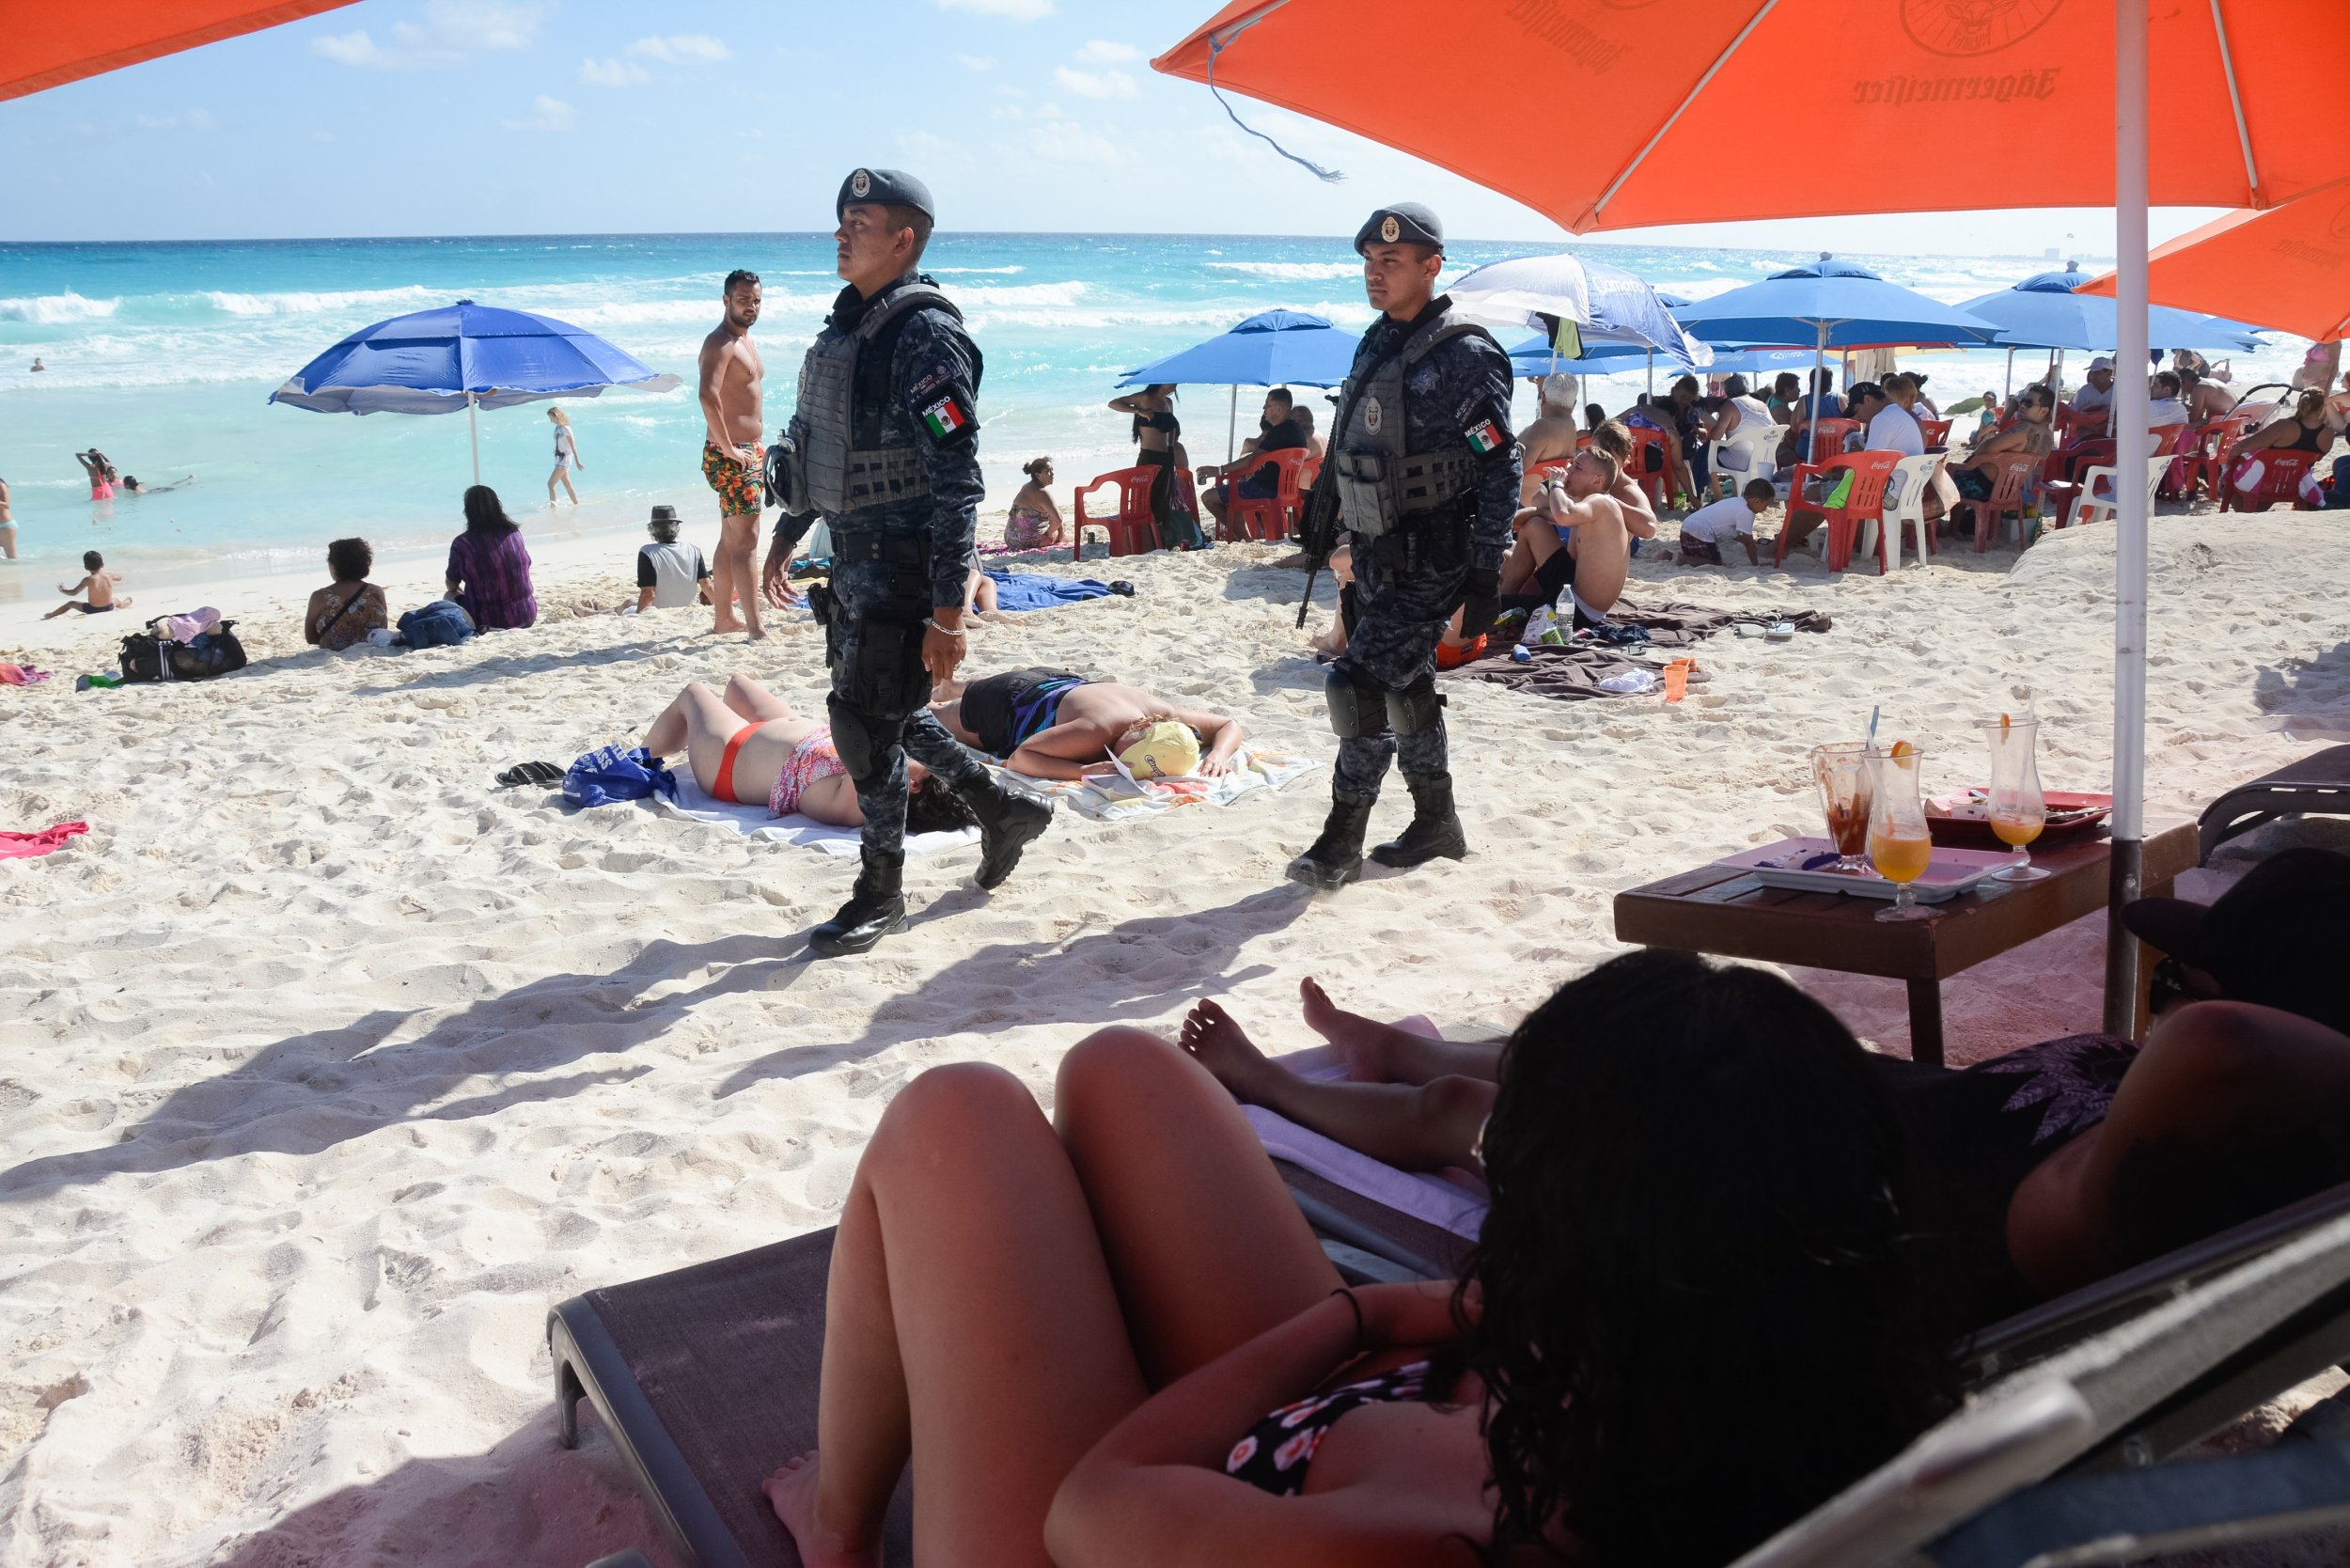 Conheça a praia nudista onde o sexo é liberado  iBahia